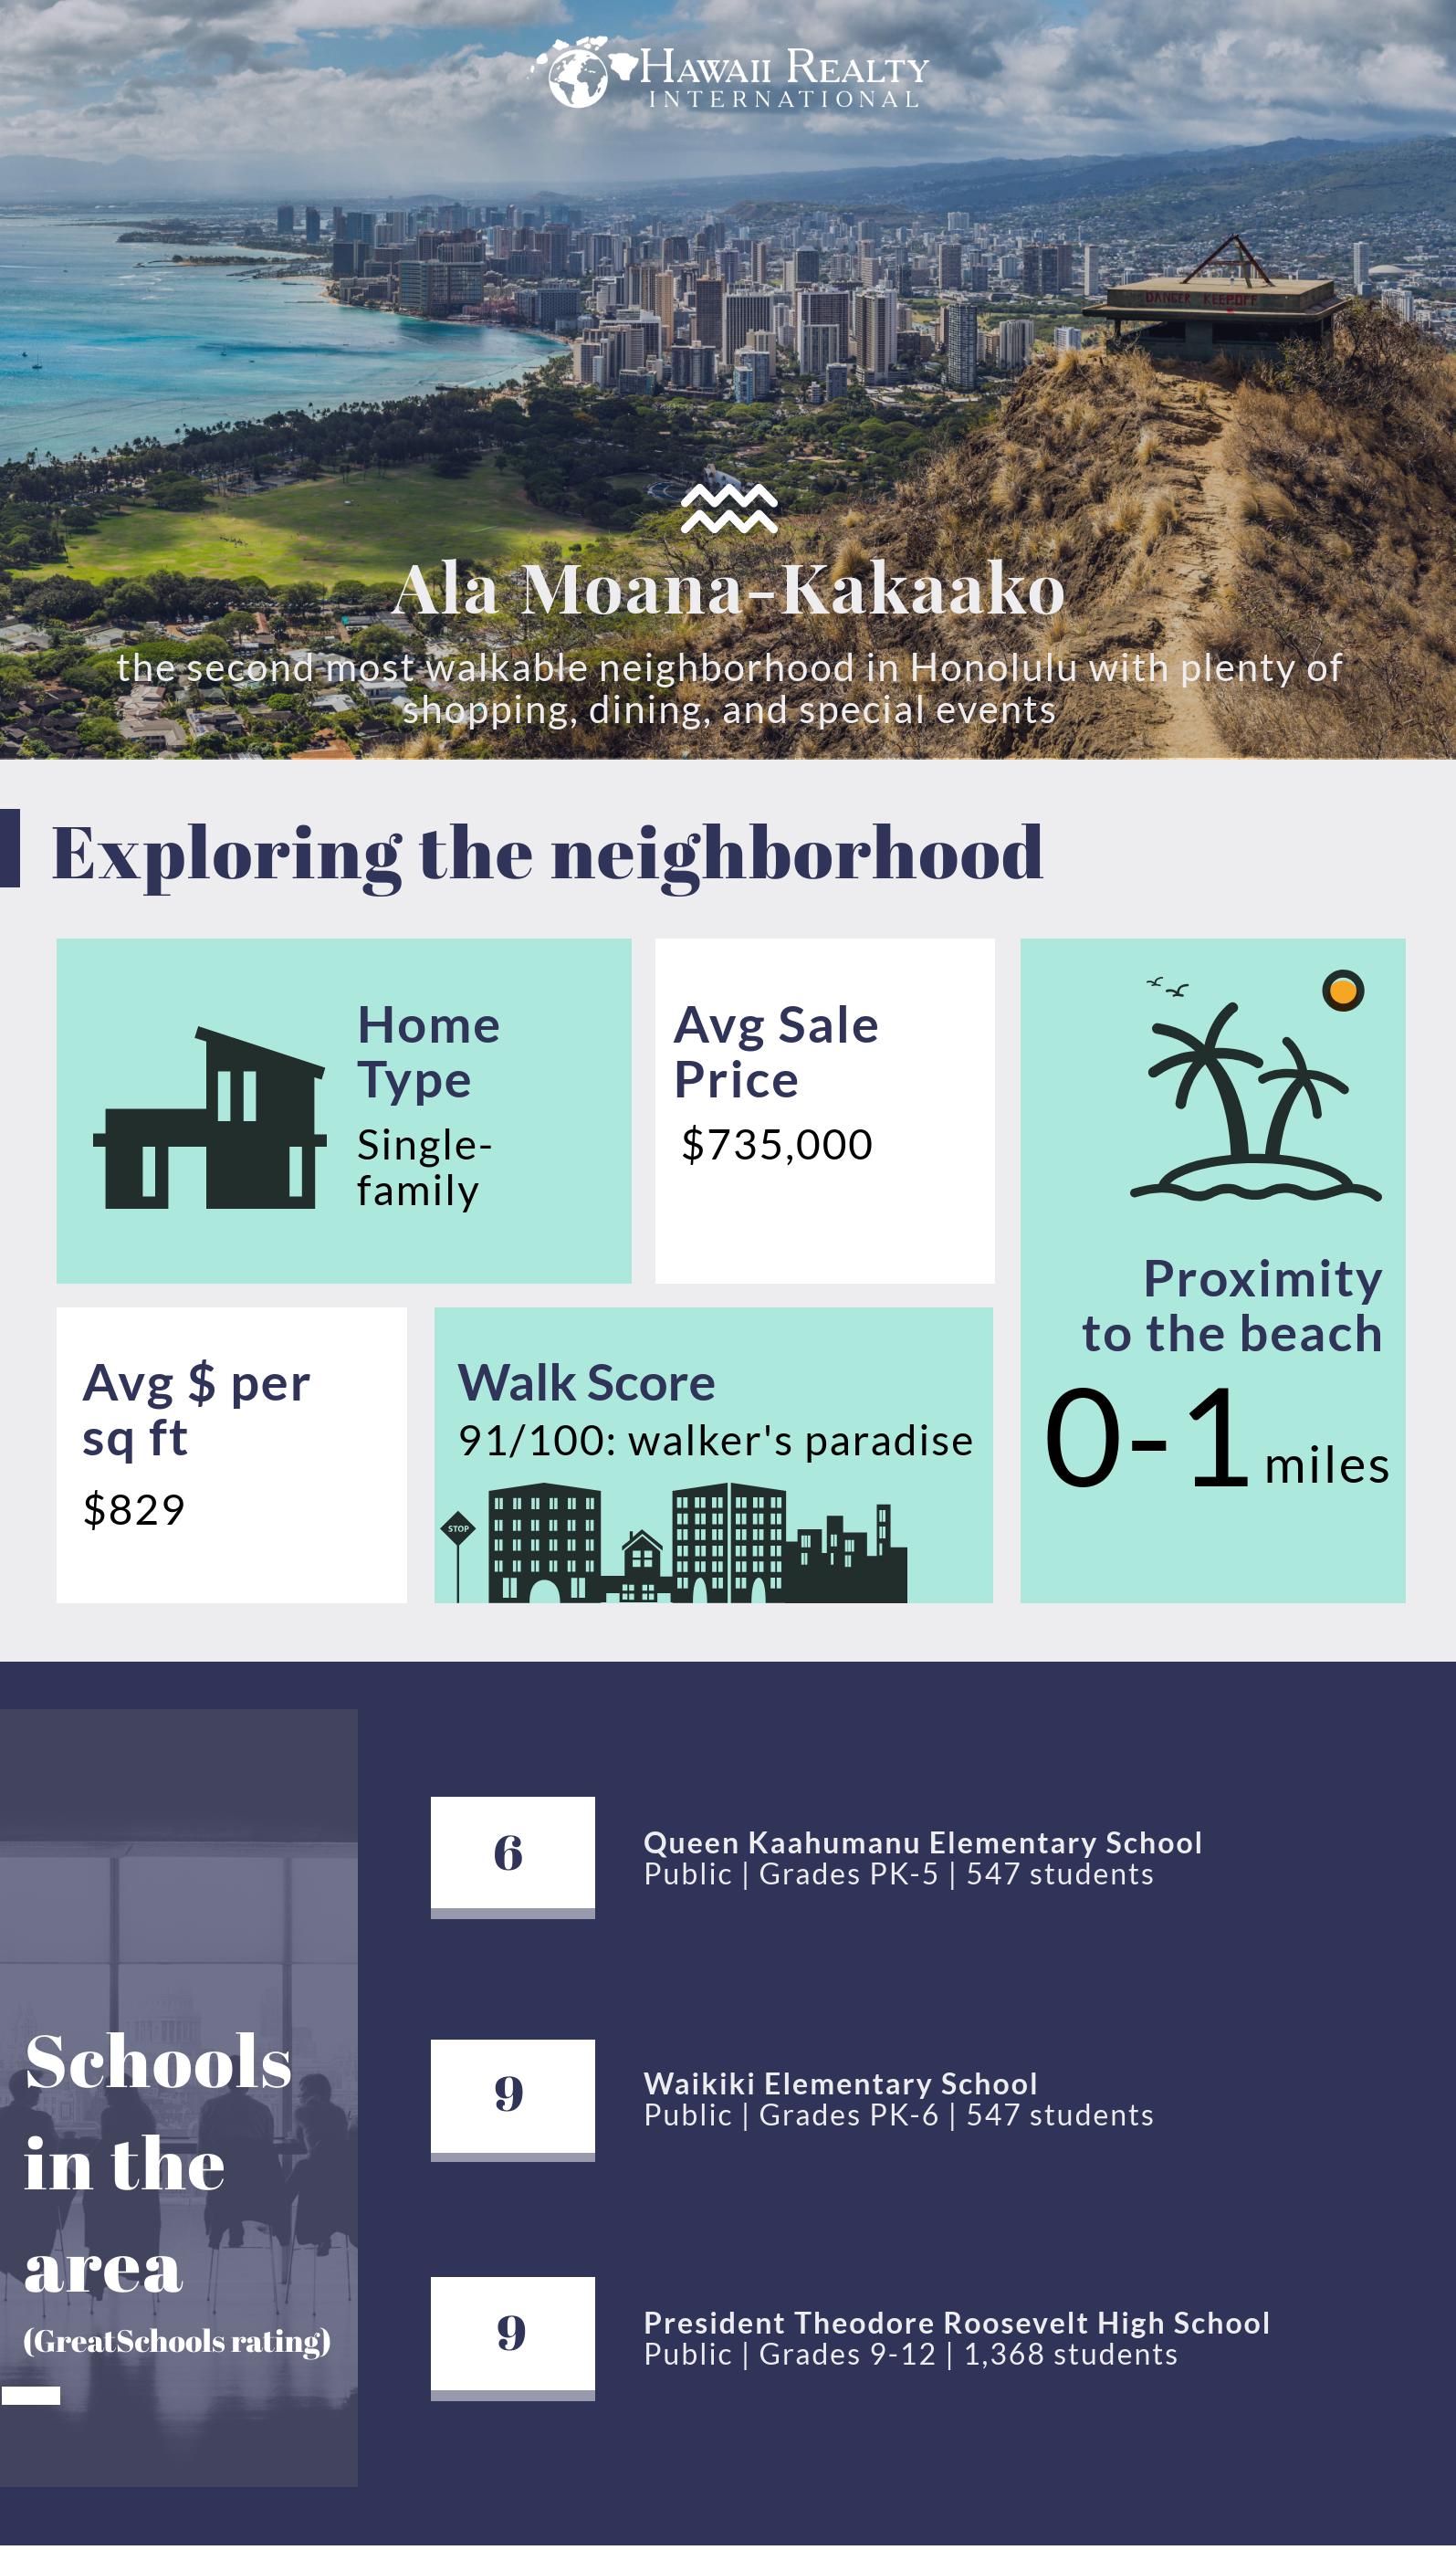 oahu homes for sale, oahu real estate